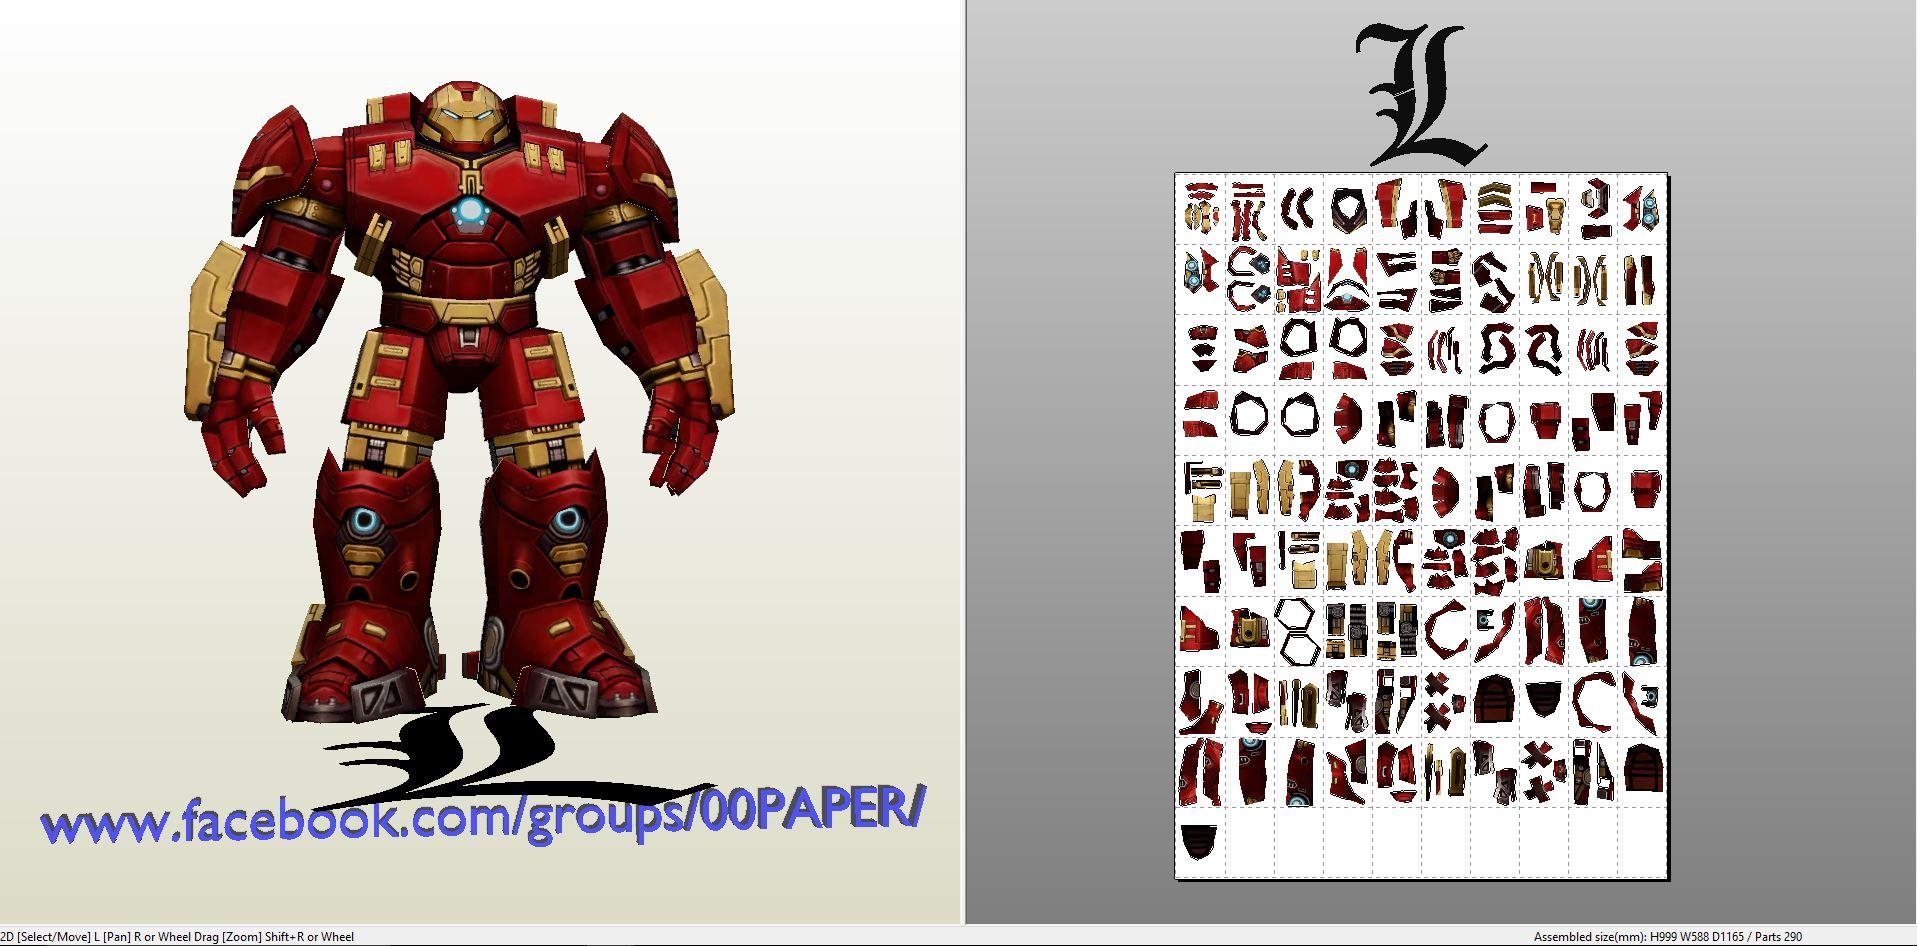 Papercraft .pdo file template for Iron Man - Hulkbuster Figure.